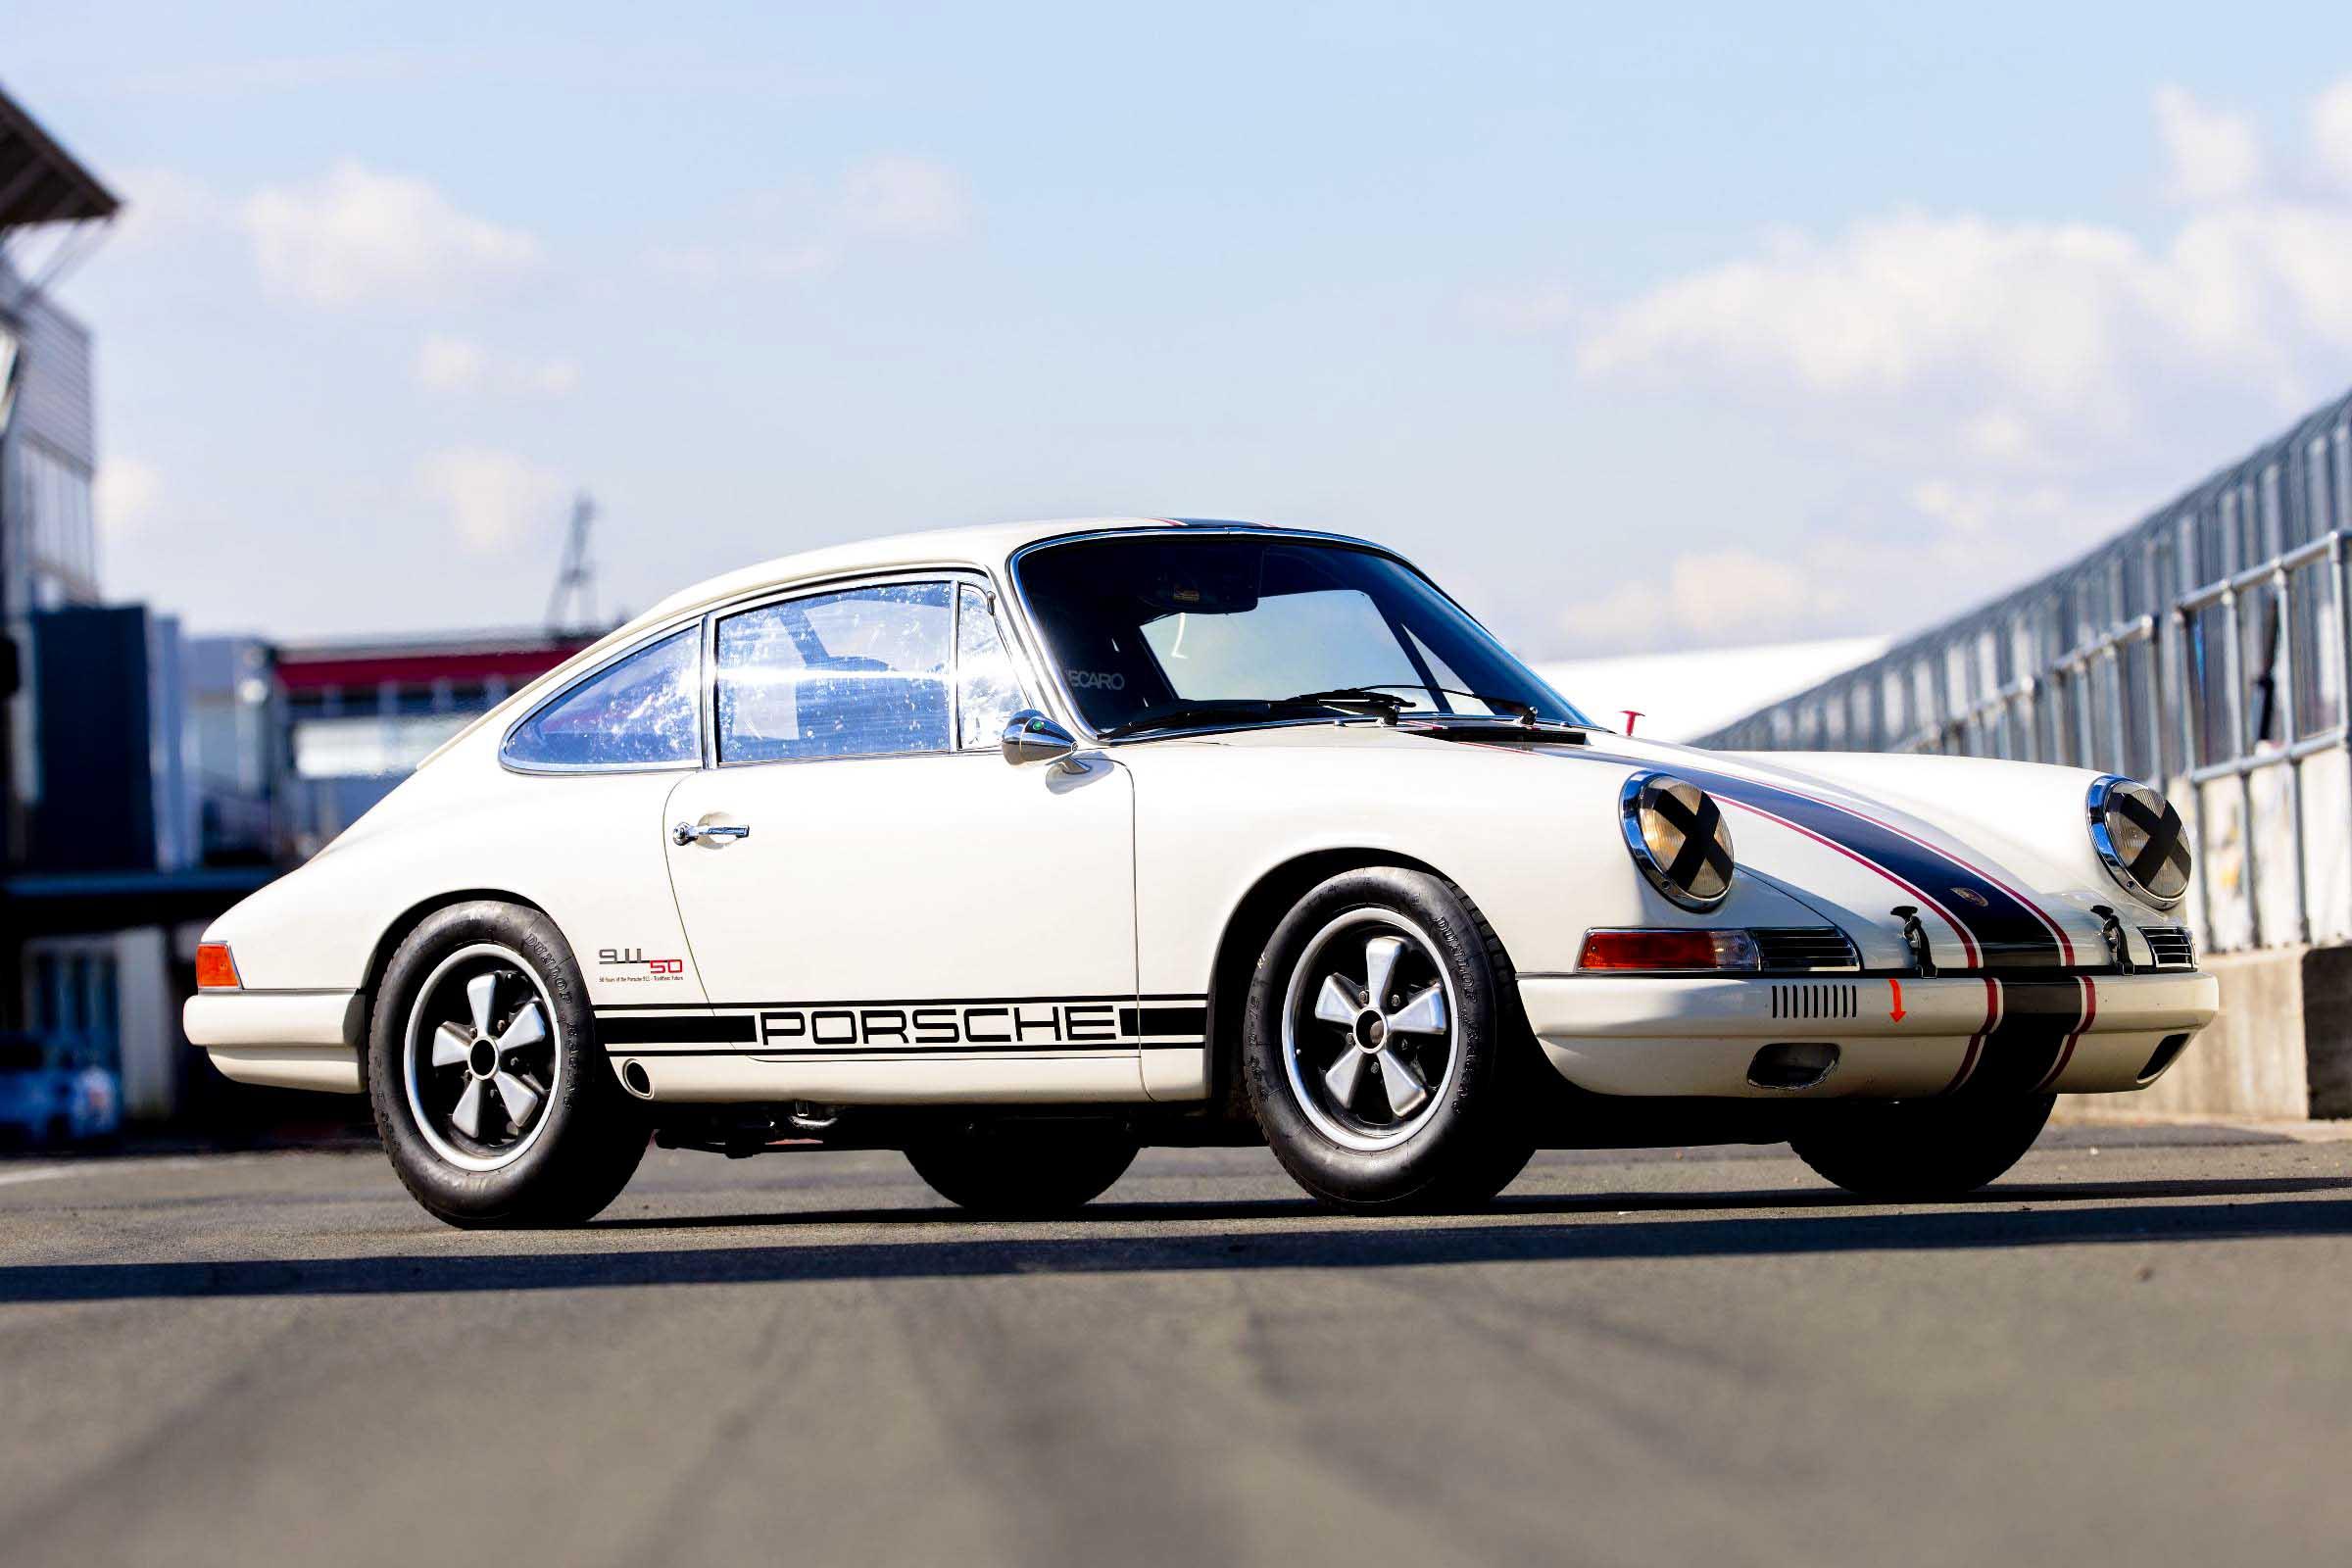 Porsche-911-4 (1 of 1)